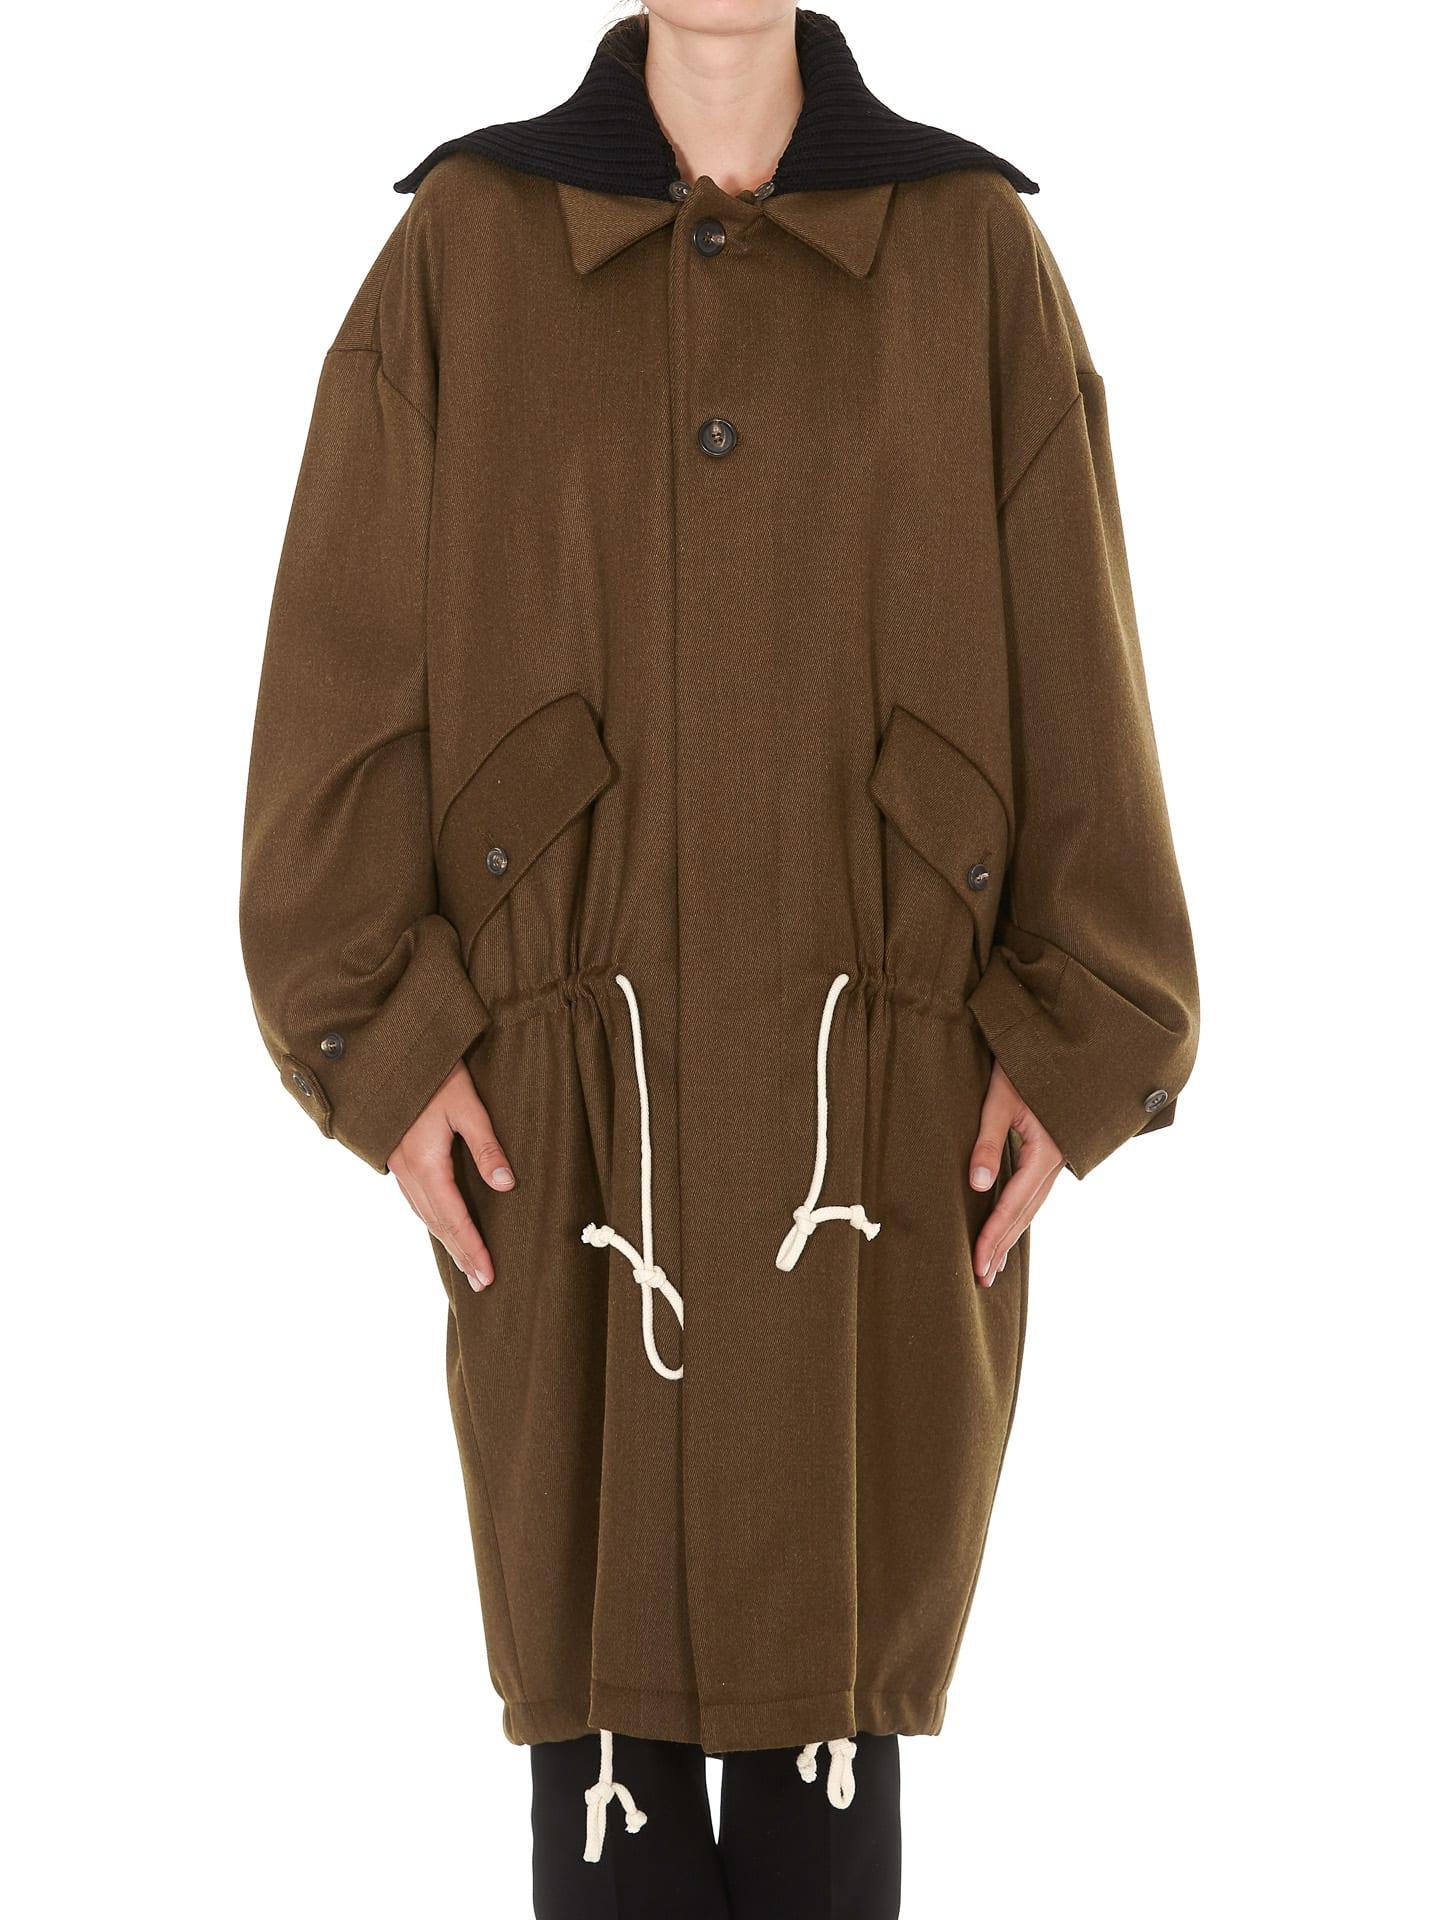 Plan C Long Parka Coat